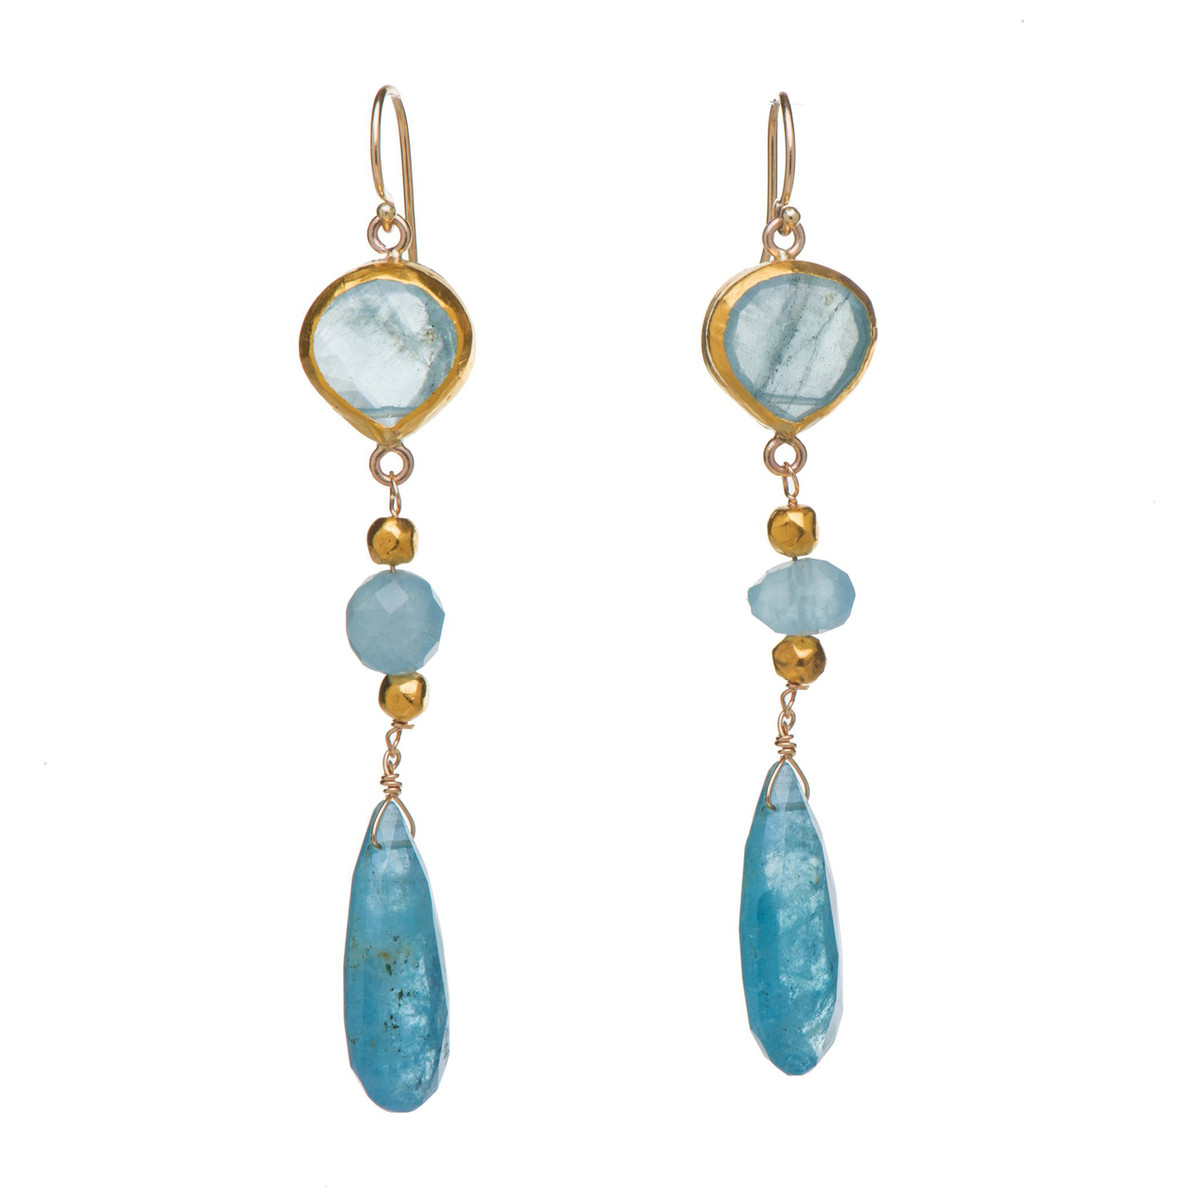 Aquamarine Lifetime Earrings by Nava Zahavi - New Arrival